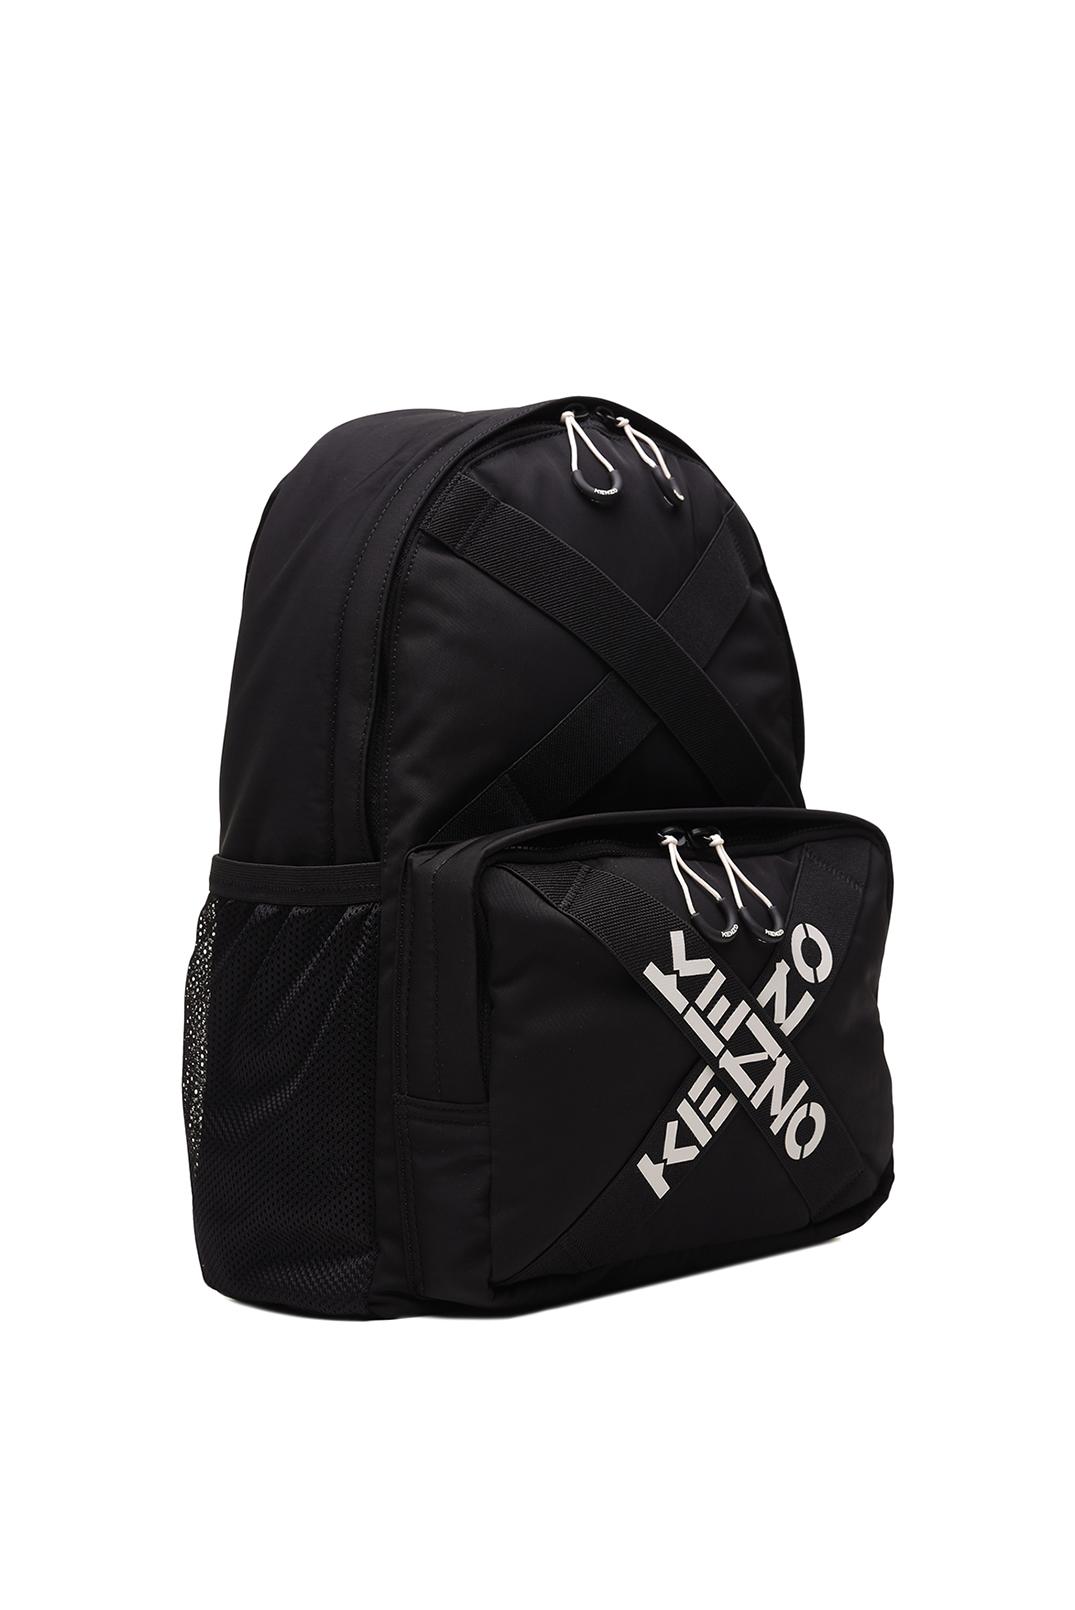 Рюкзак с логотипом KENZO KNZa21001